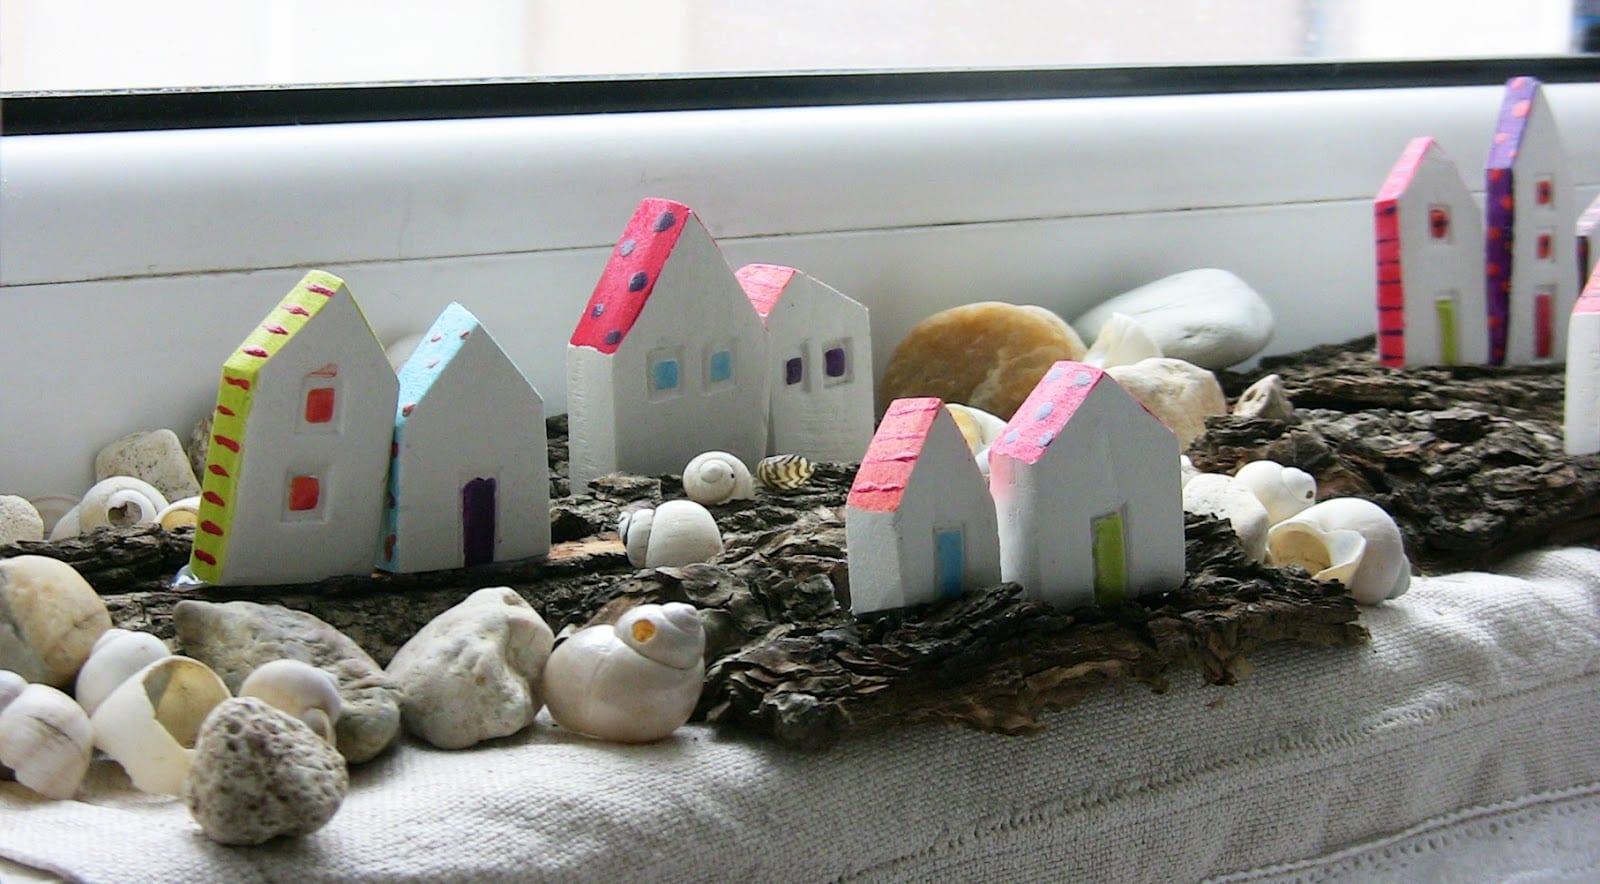 deko idee mit häusern aus erdtone